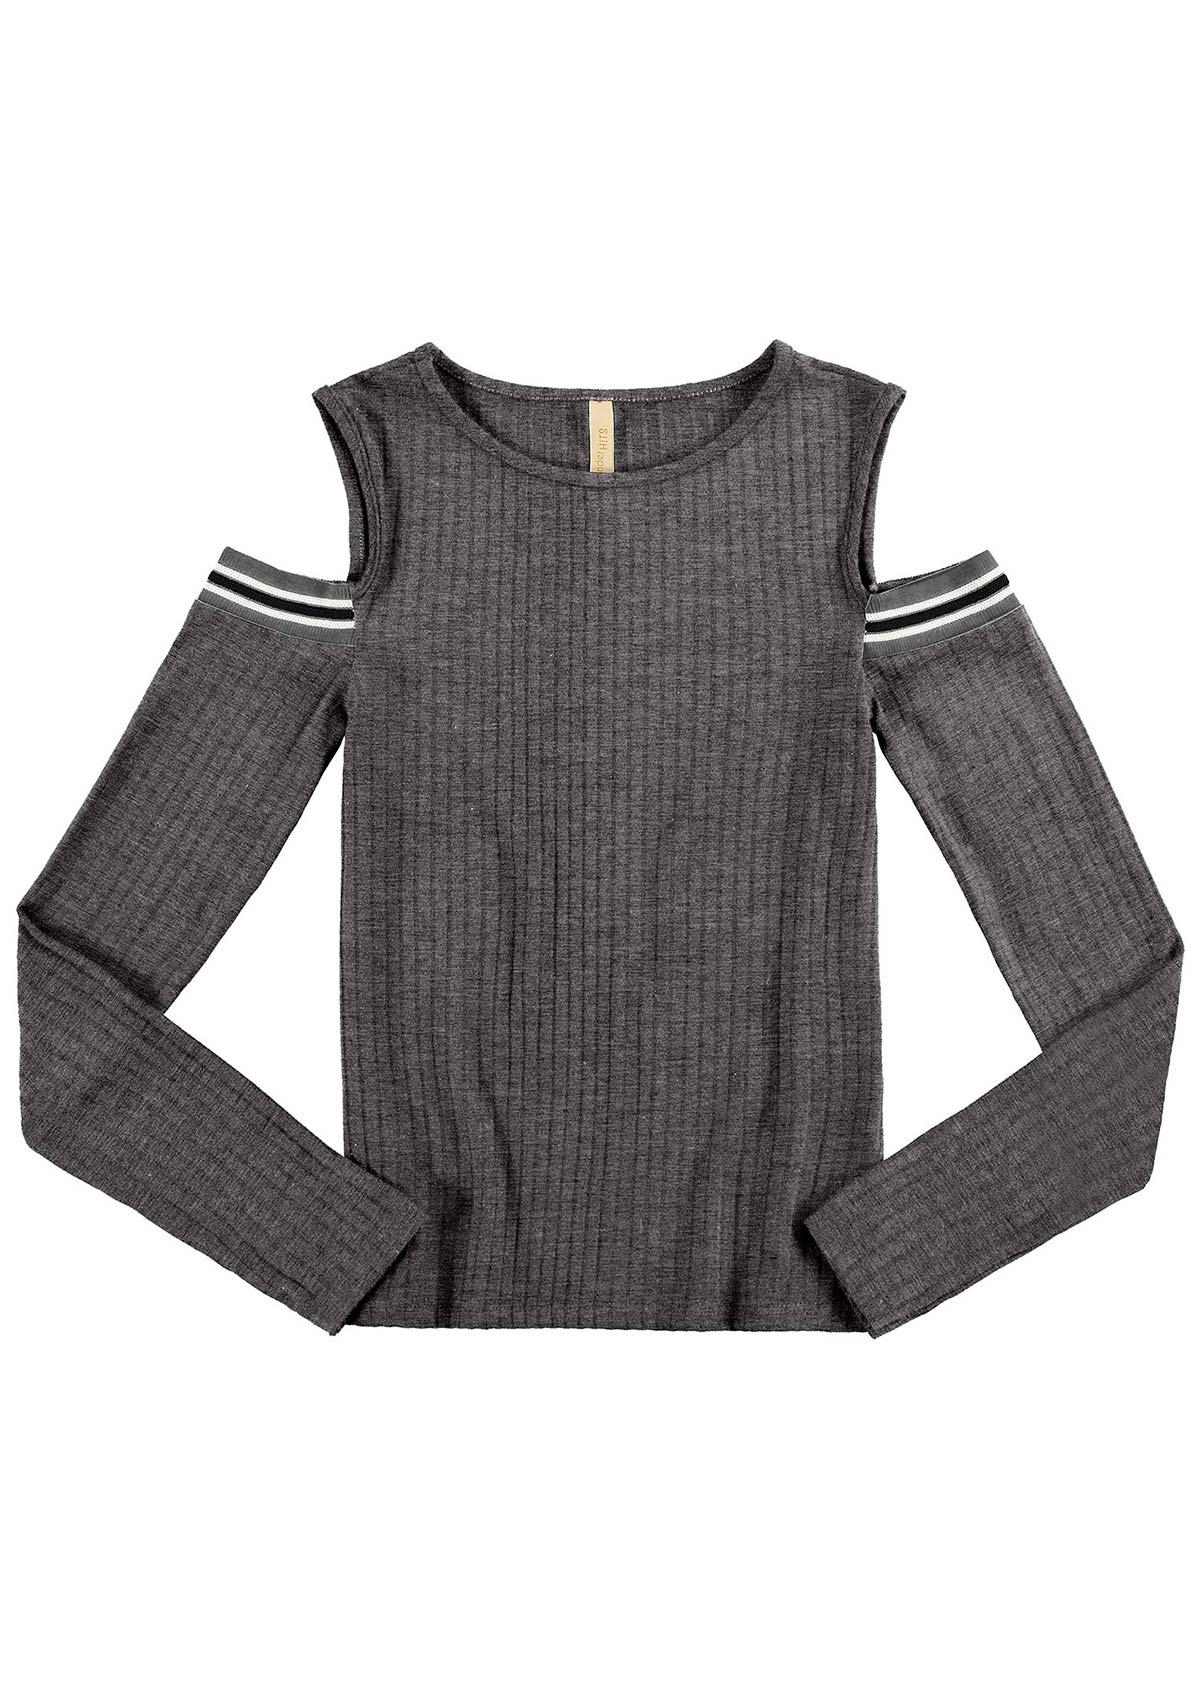 Blusa Infantil Feminino Inverno Cinza Ombro Vazado Alakazoo